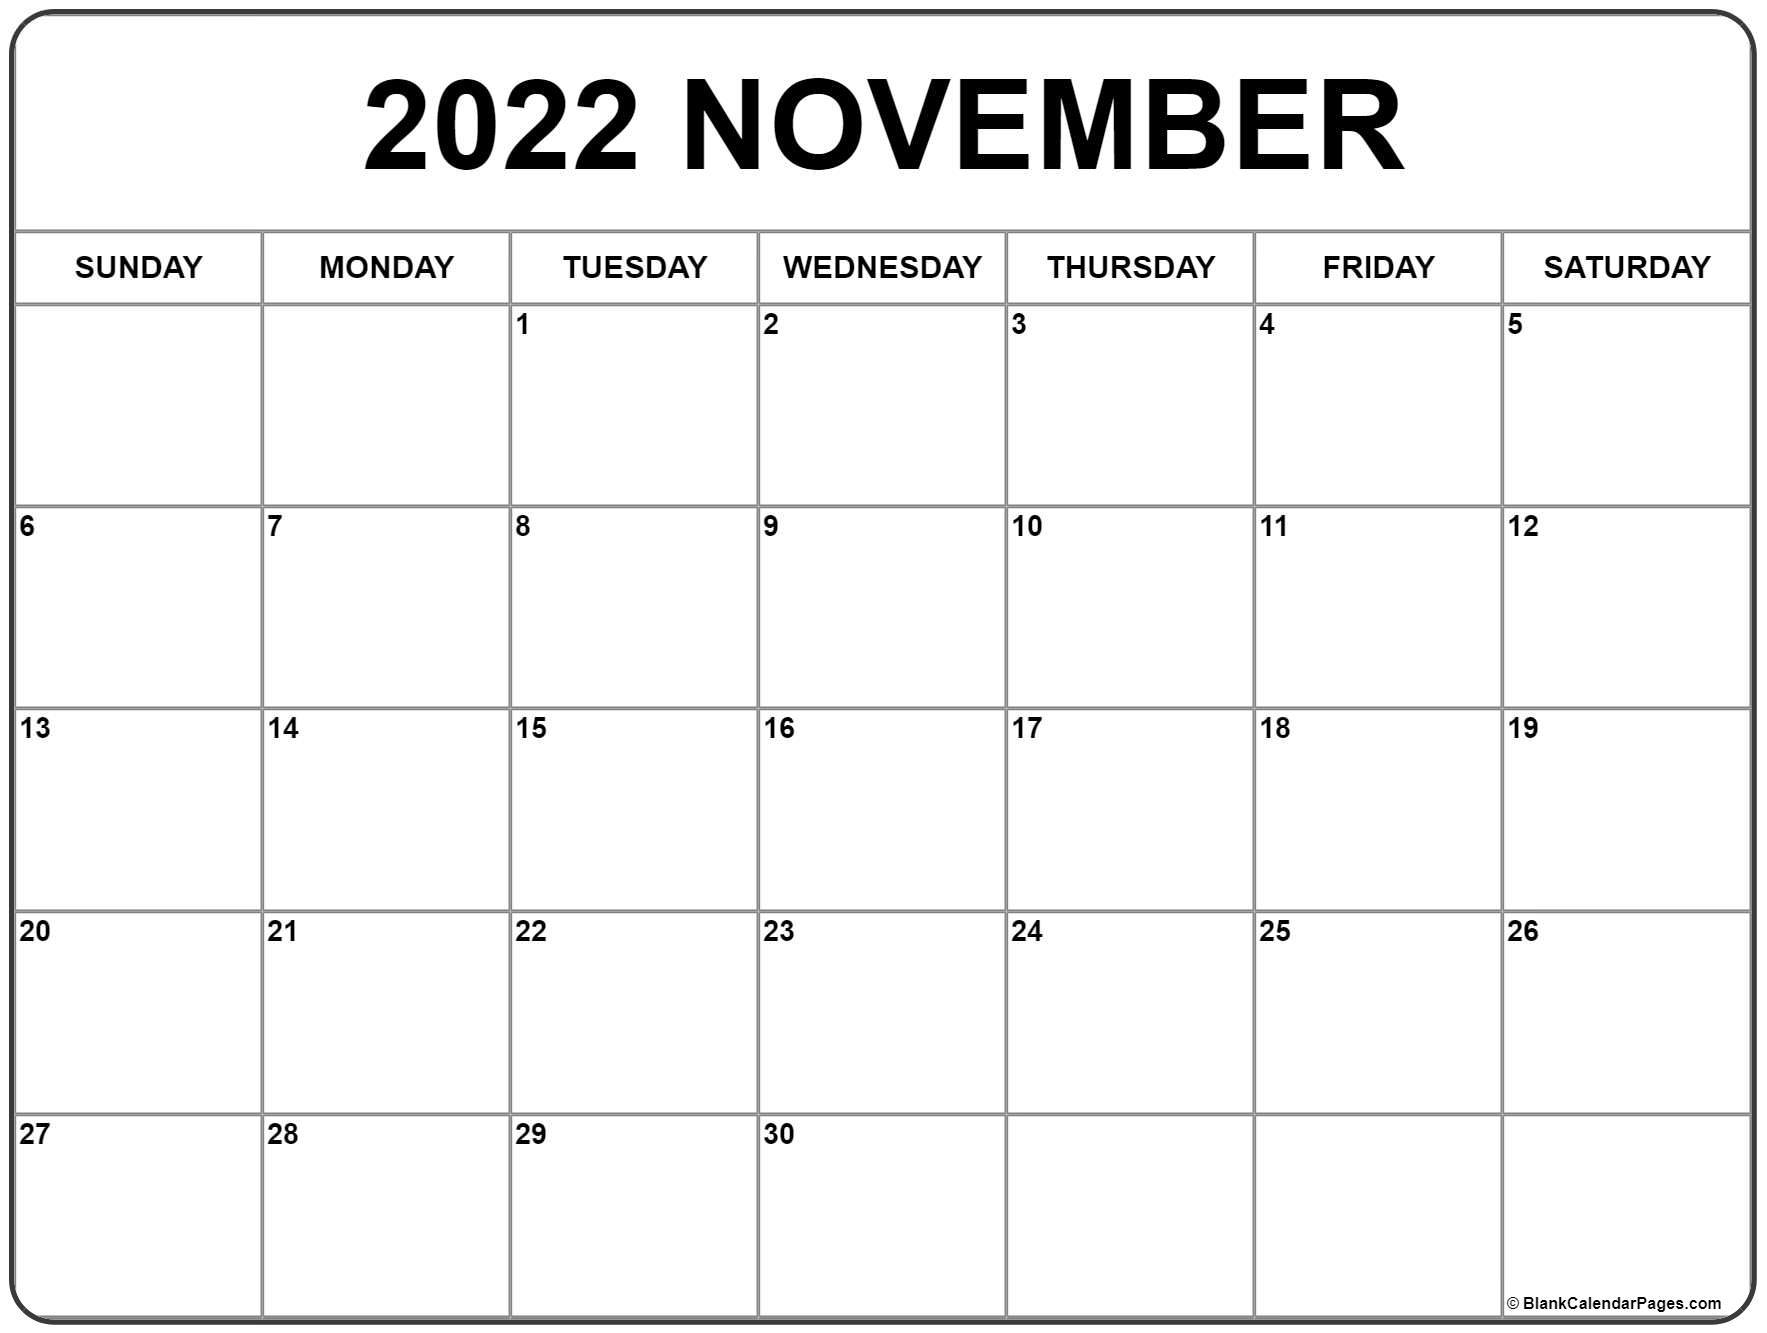 November 2022 calendar .  November calendar 2022